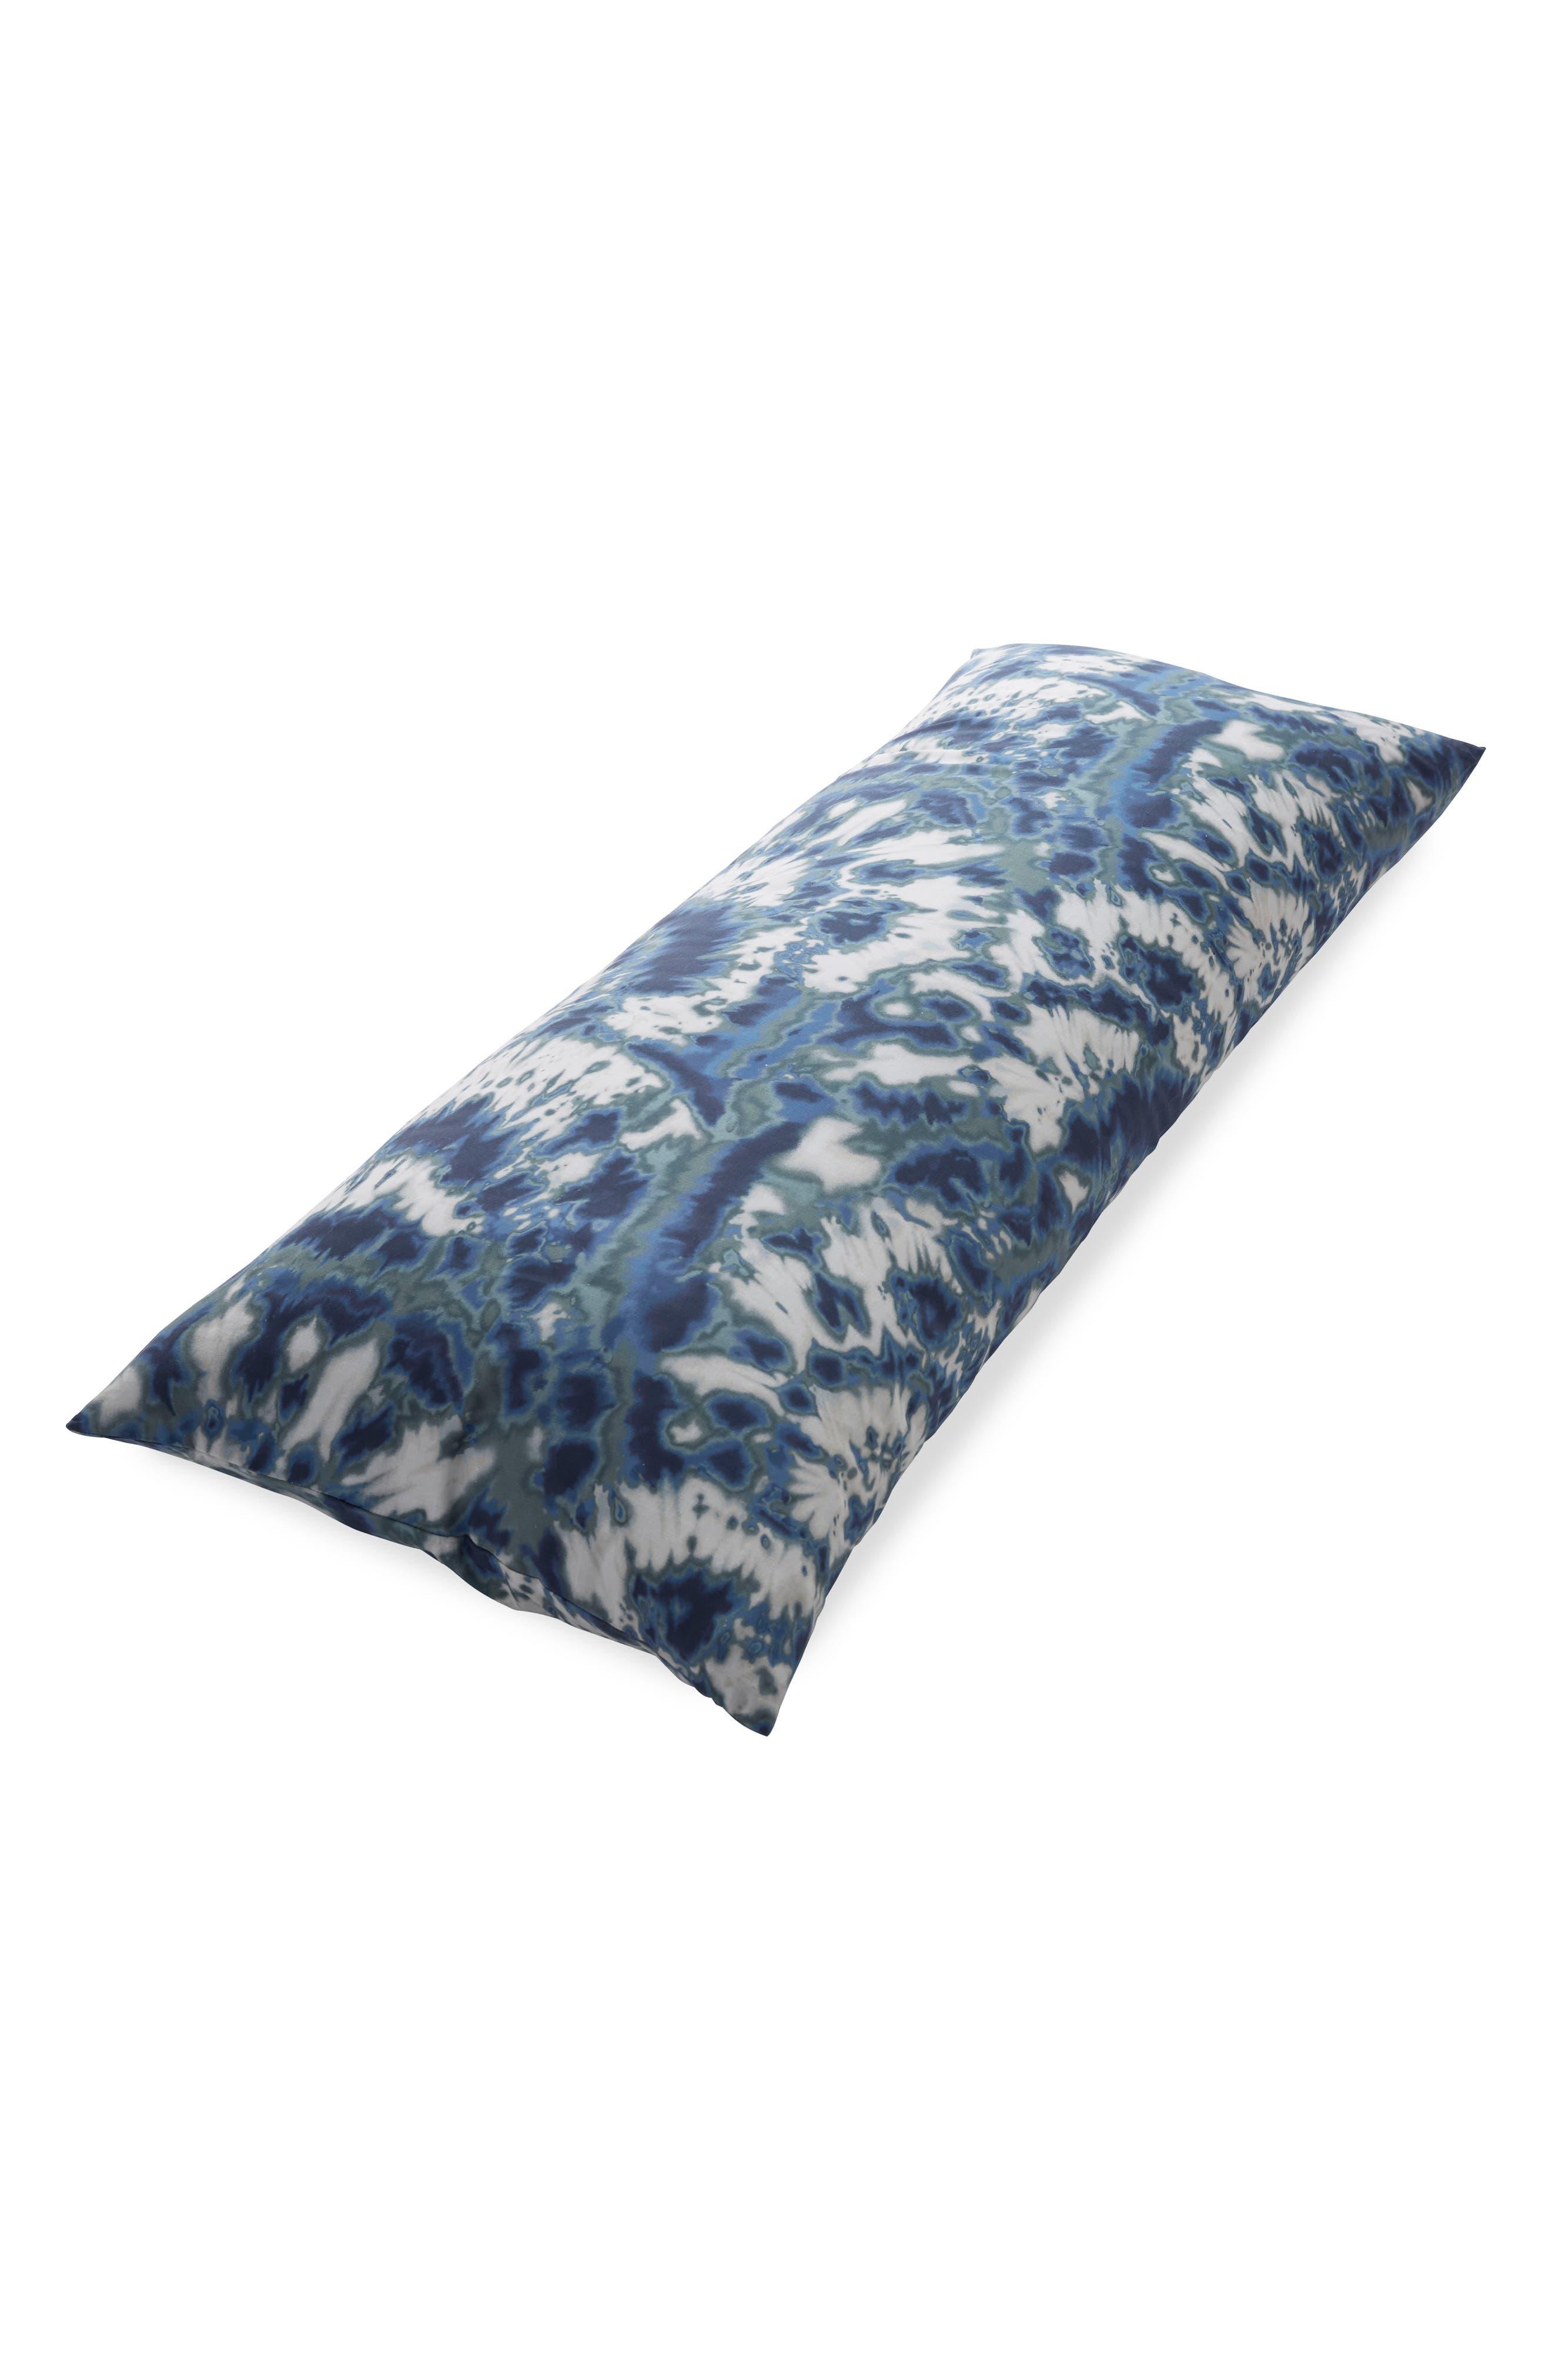 Pinwheel Body Pillow,                             Main thumbnail 1, color,                             Blue